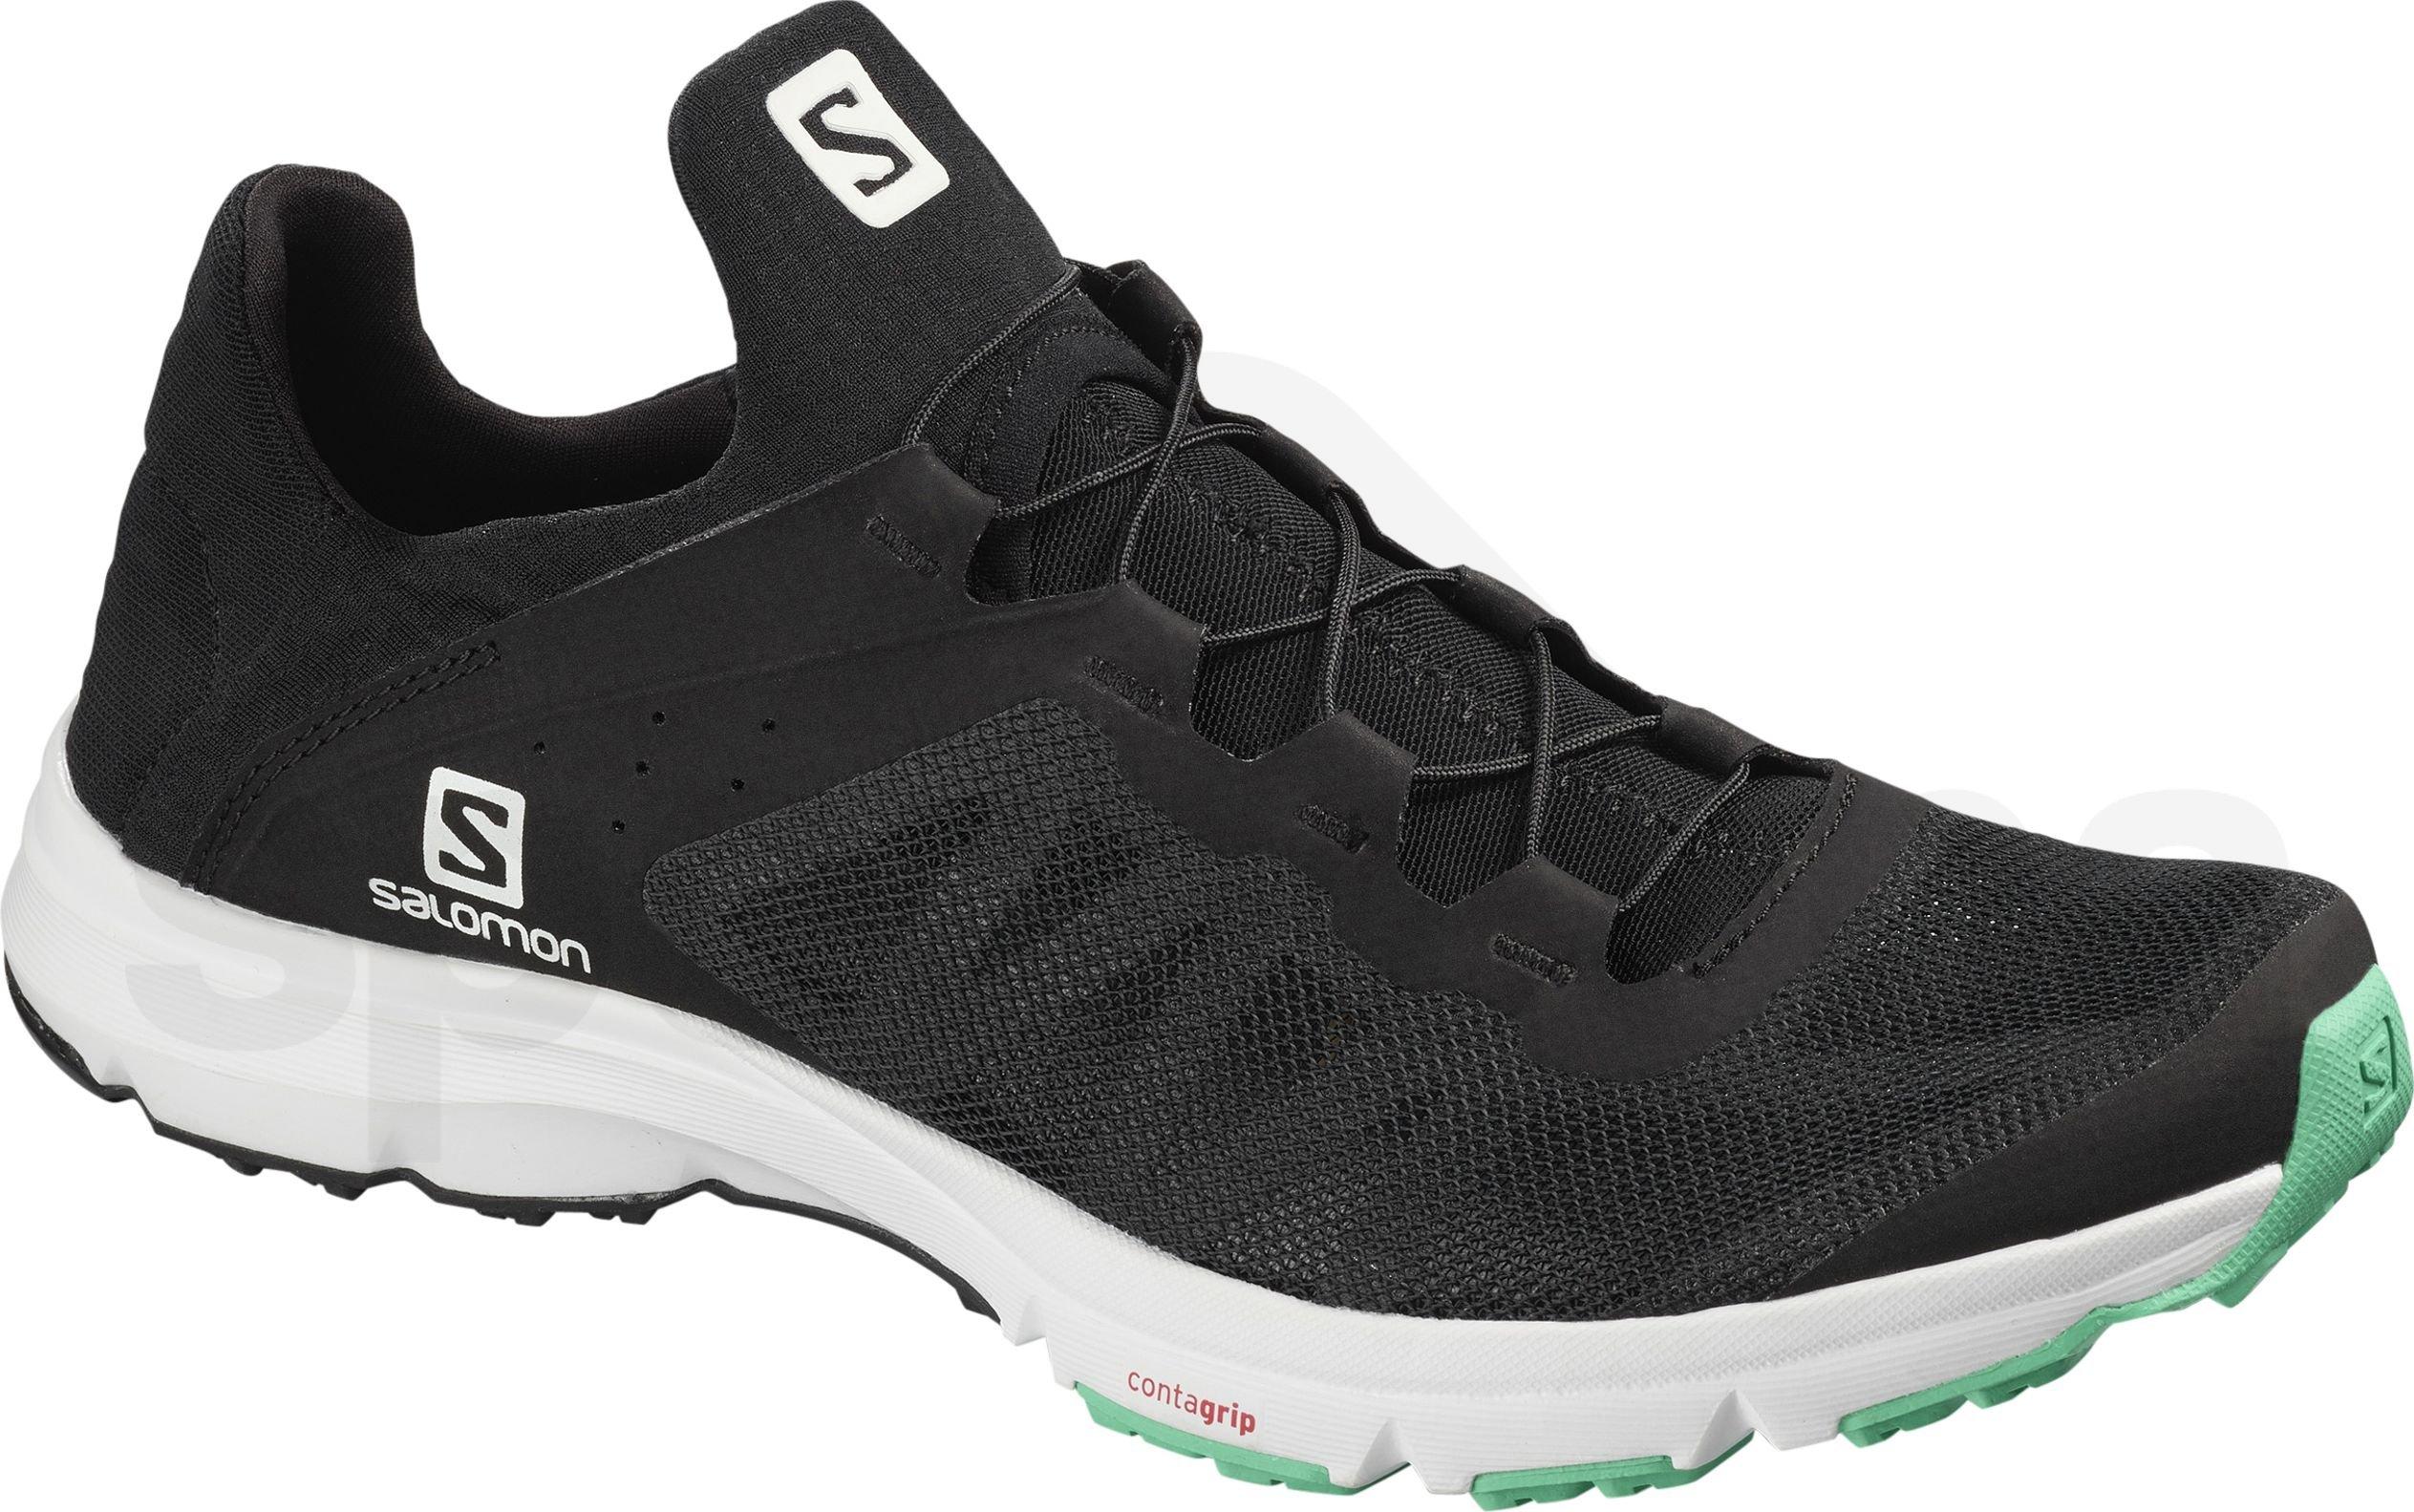 48b3cf2627a5 Dámské turistické sandály Salomon TECHAMPHIBIAN 4 W Black Ebony ...